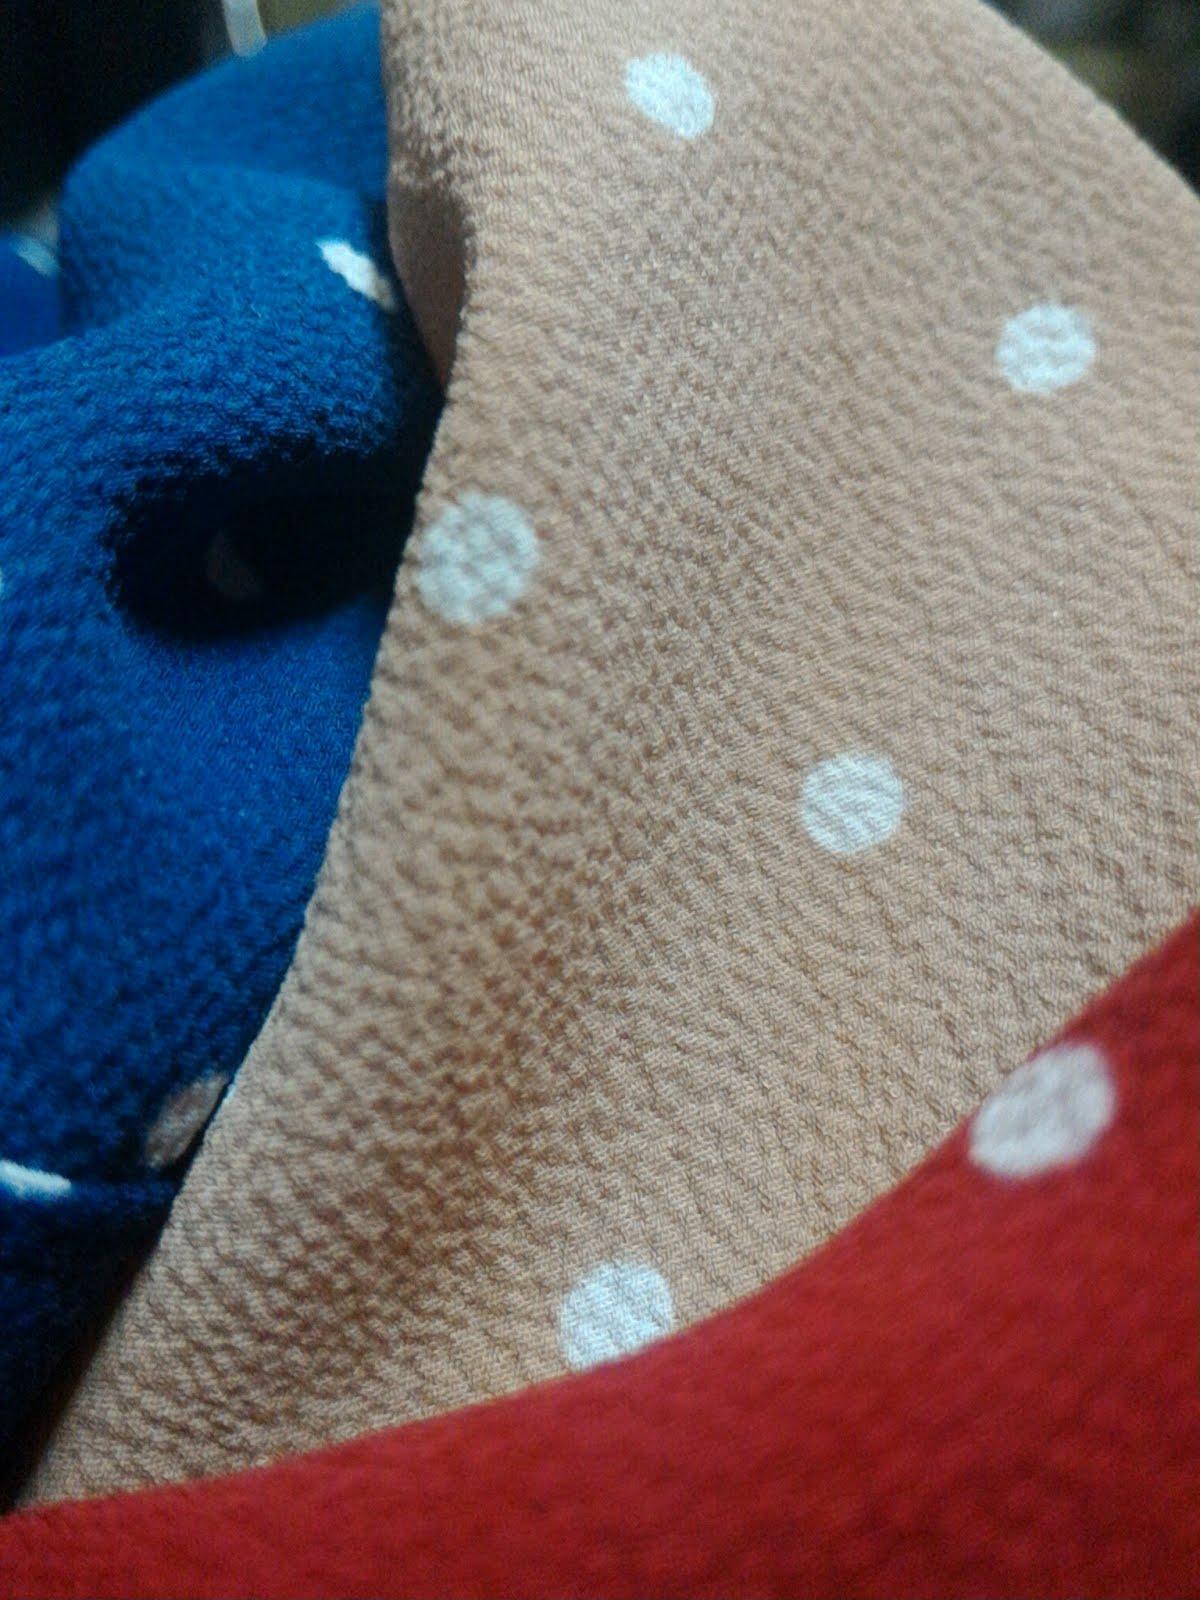 Knitted Artinya : Karakteristik kain koshibo nafstyle big size